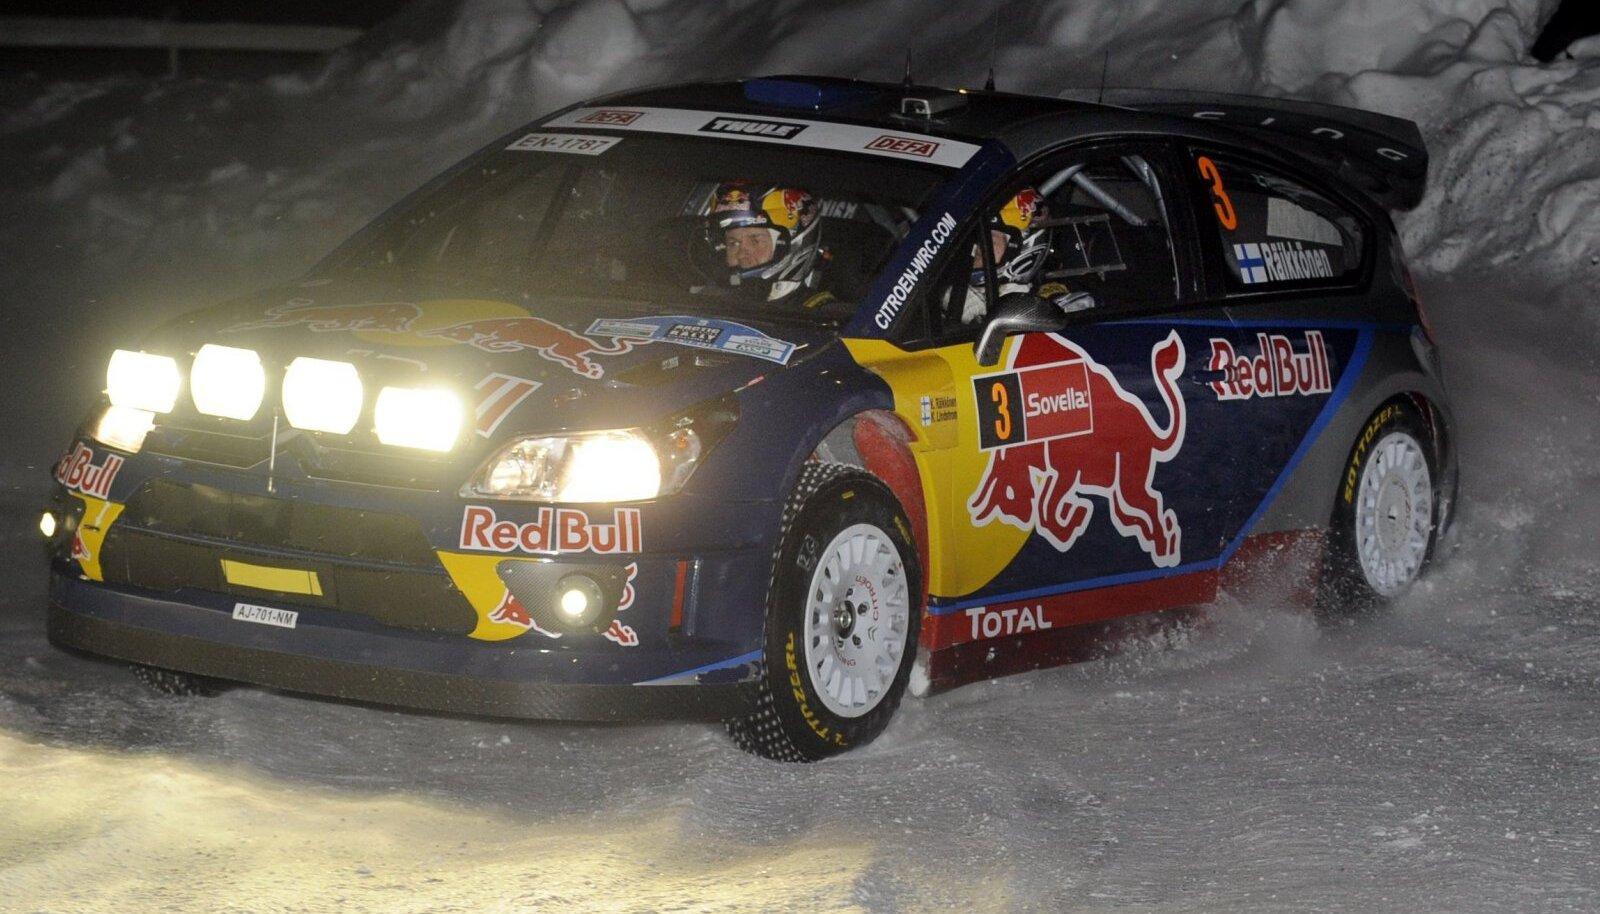 Kimi Räikkönen 2010. aastal Arctic Lapland Rallyl.